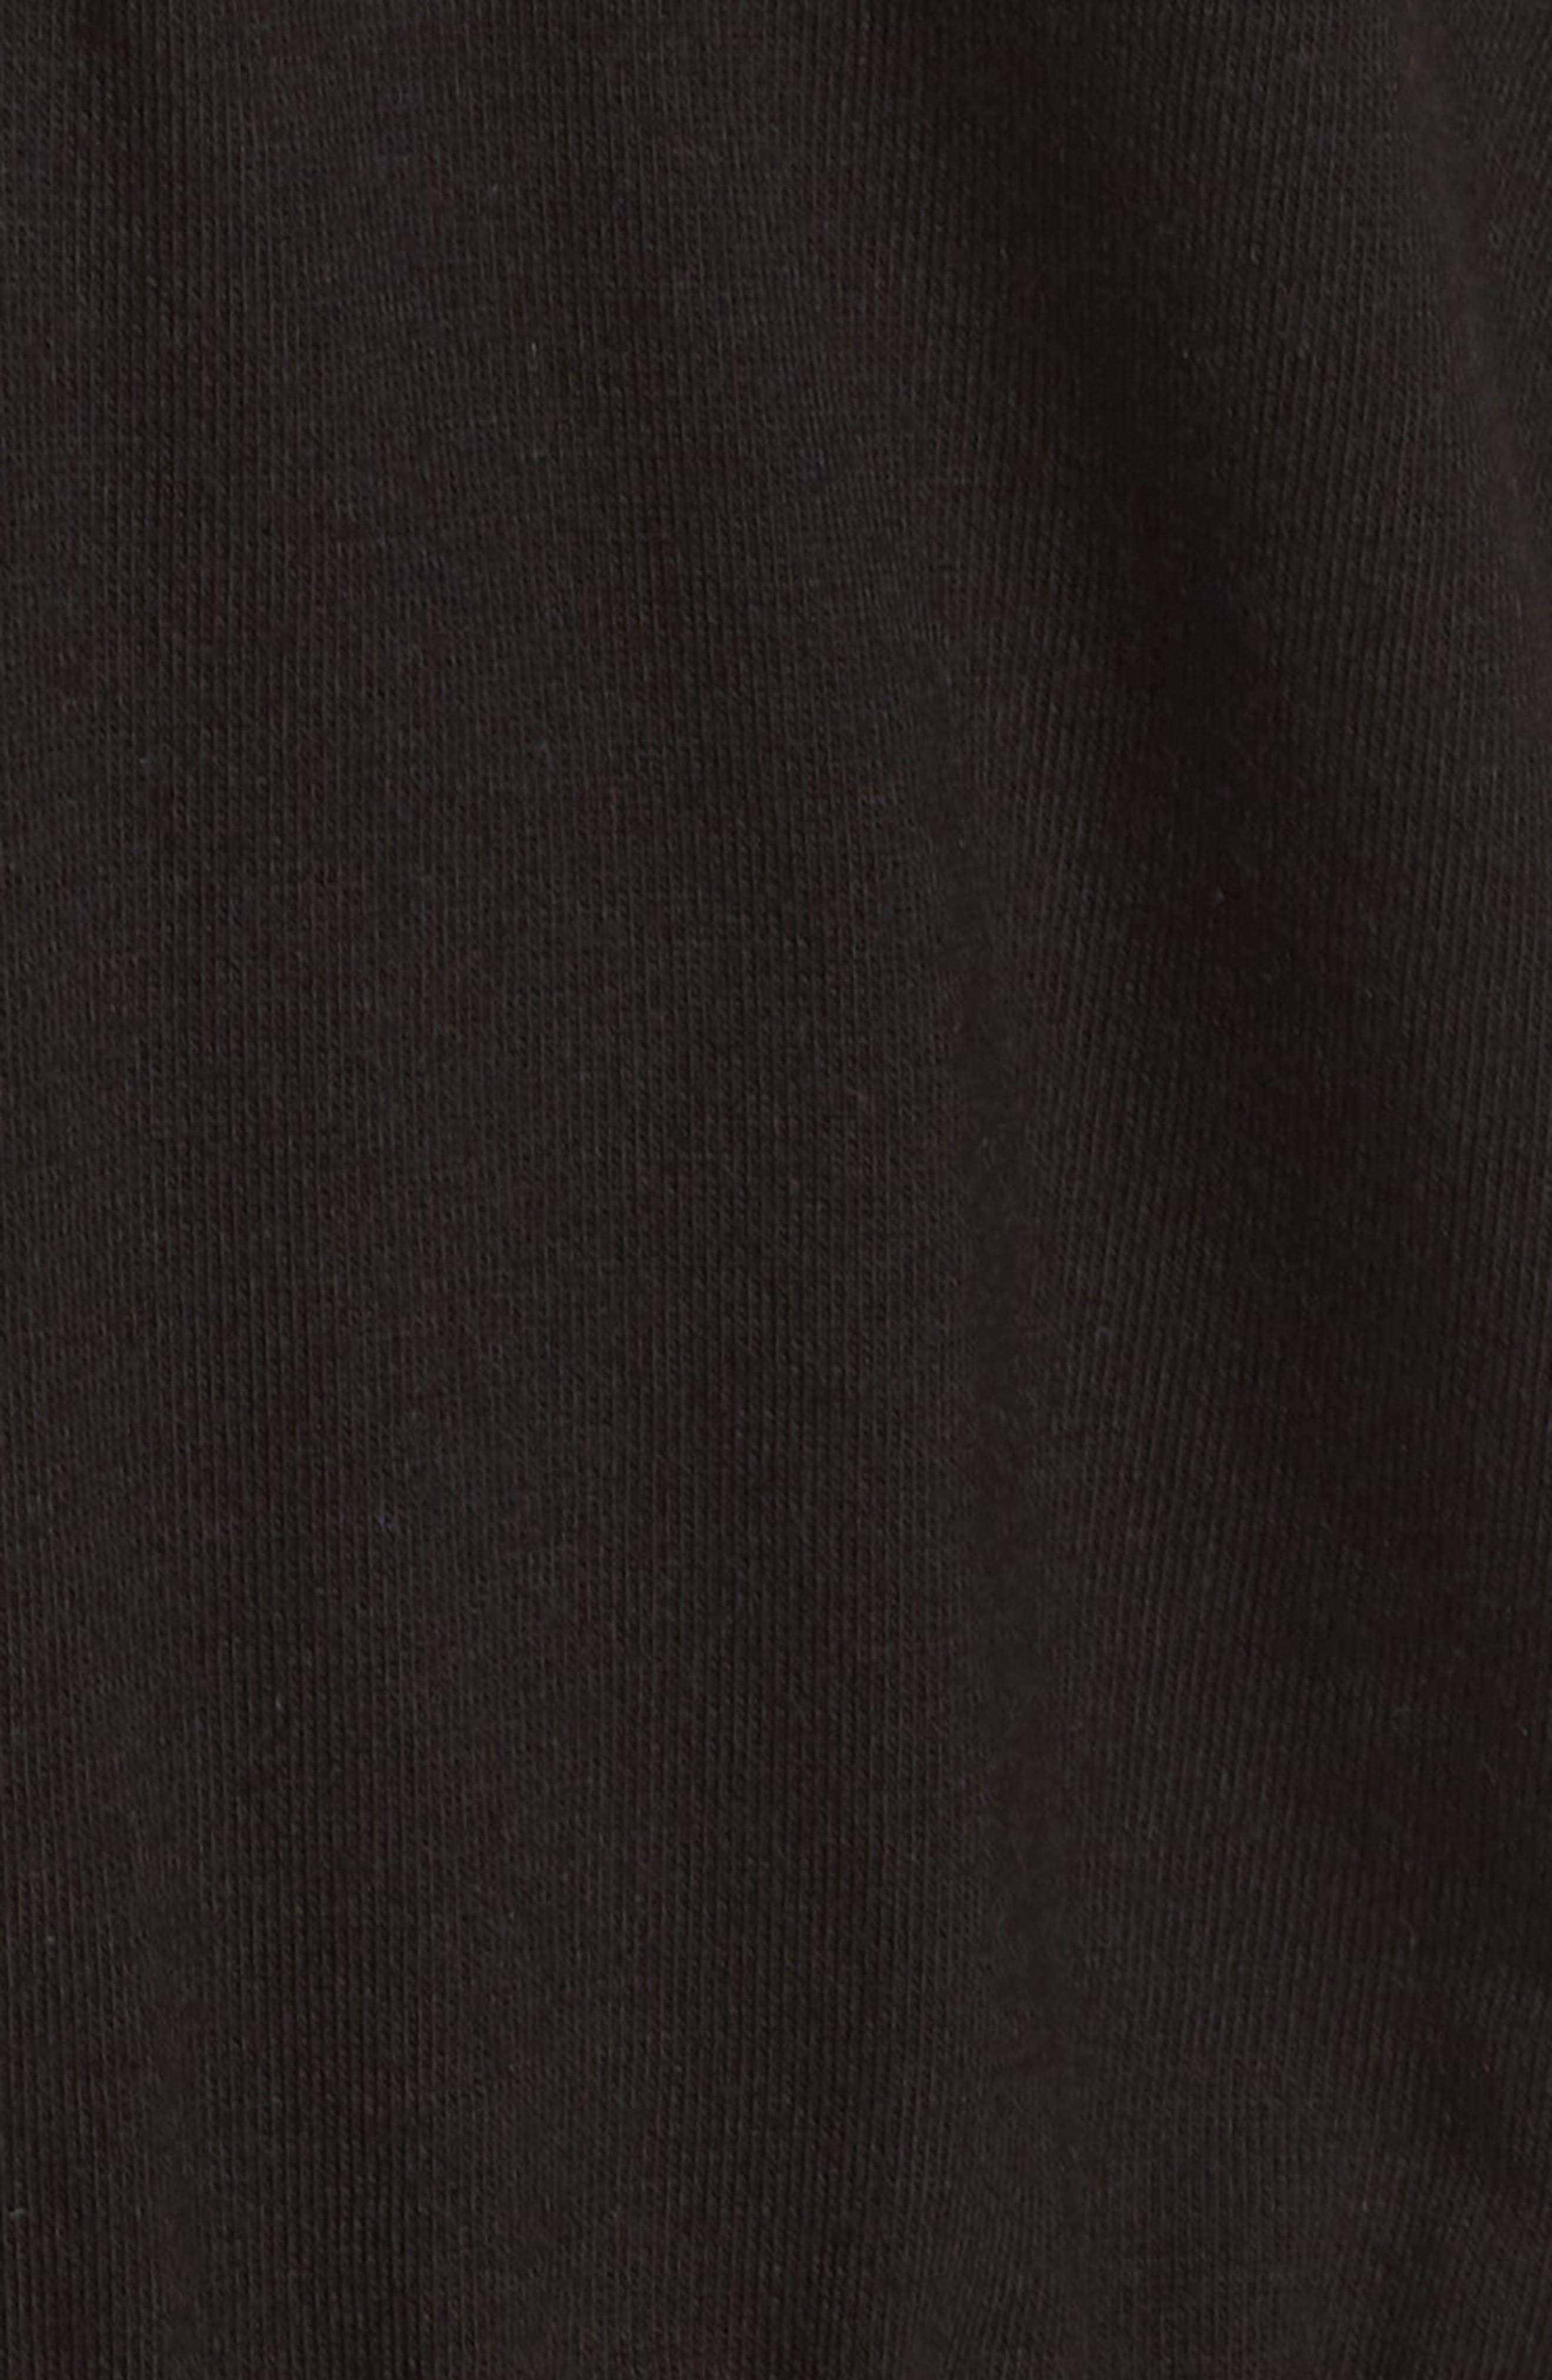 Romper Pajamas,                             Alternate thumbnail 5, color,                             BLACK